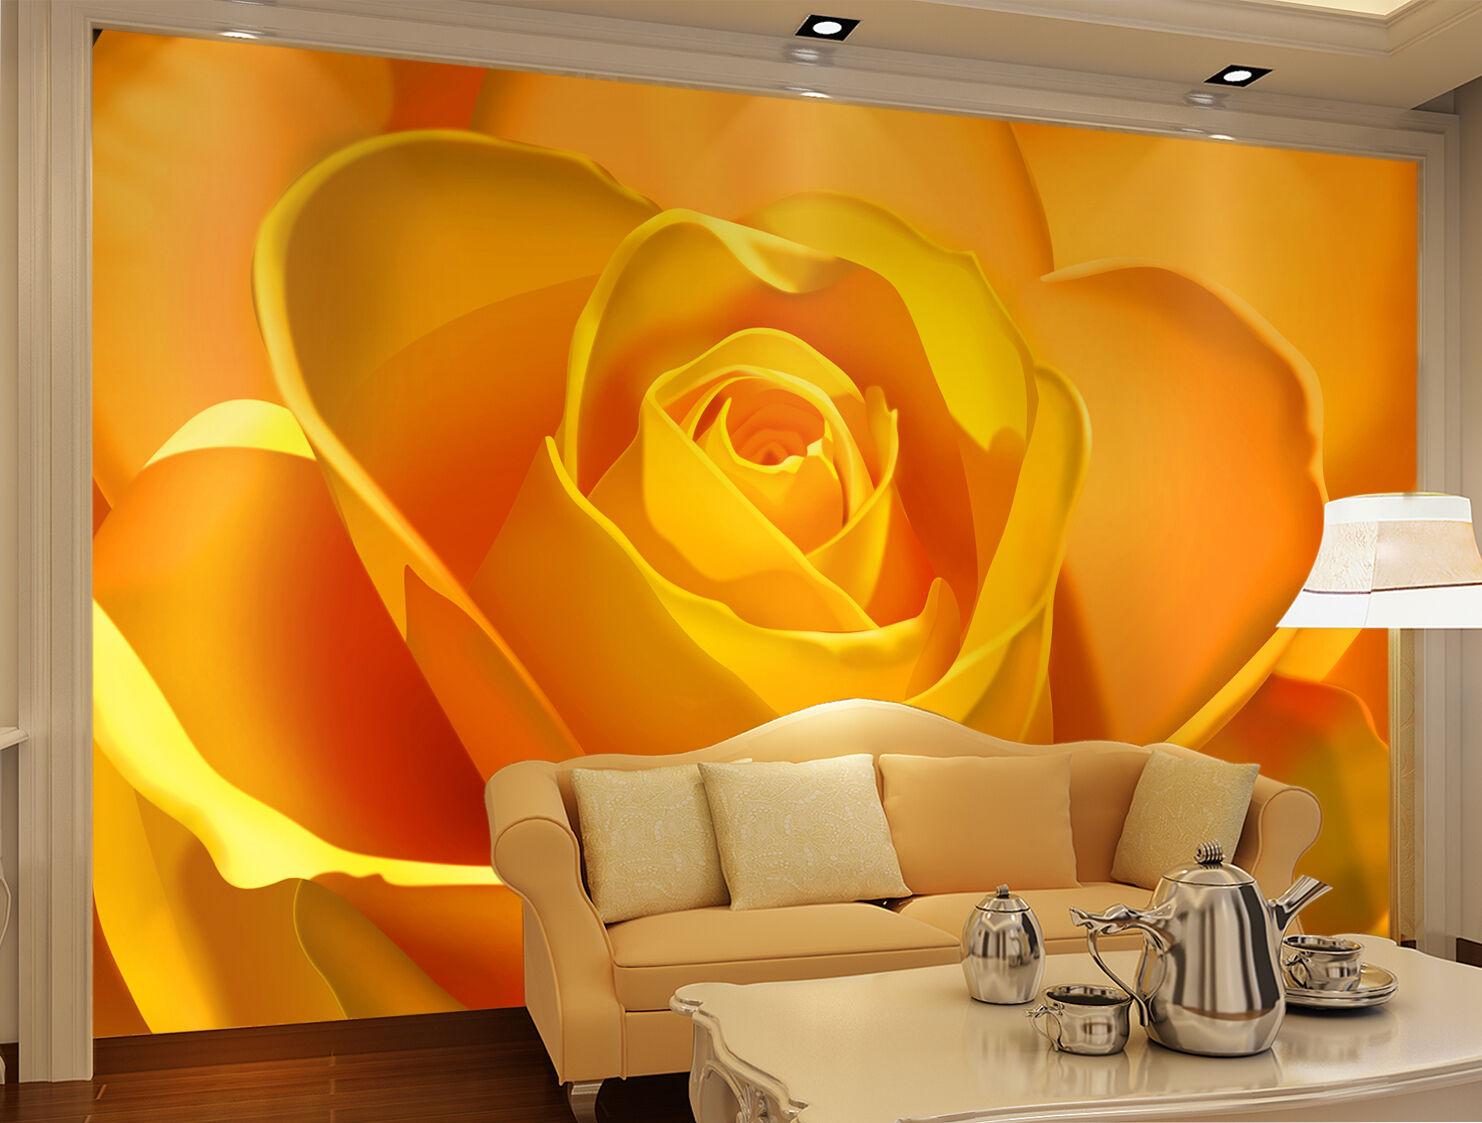 3D Blooming Flower 741 Wallpaper Decal Dercor Home Kids Nursery Mural  Home